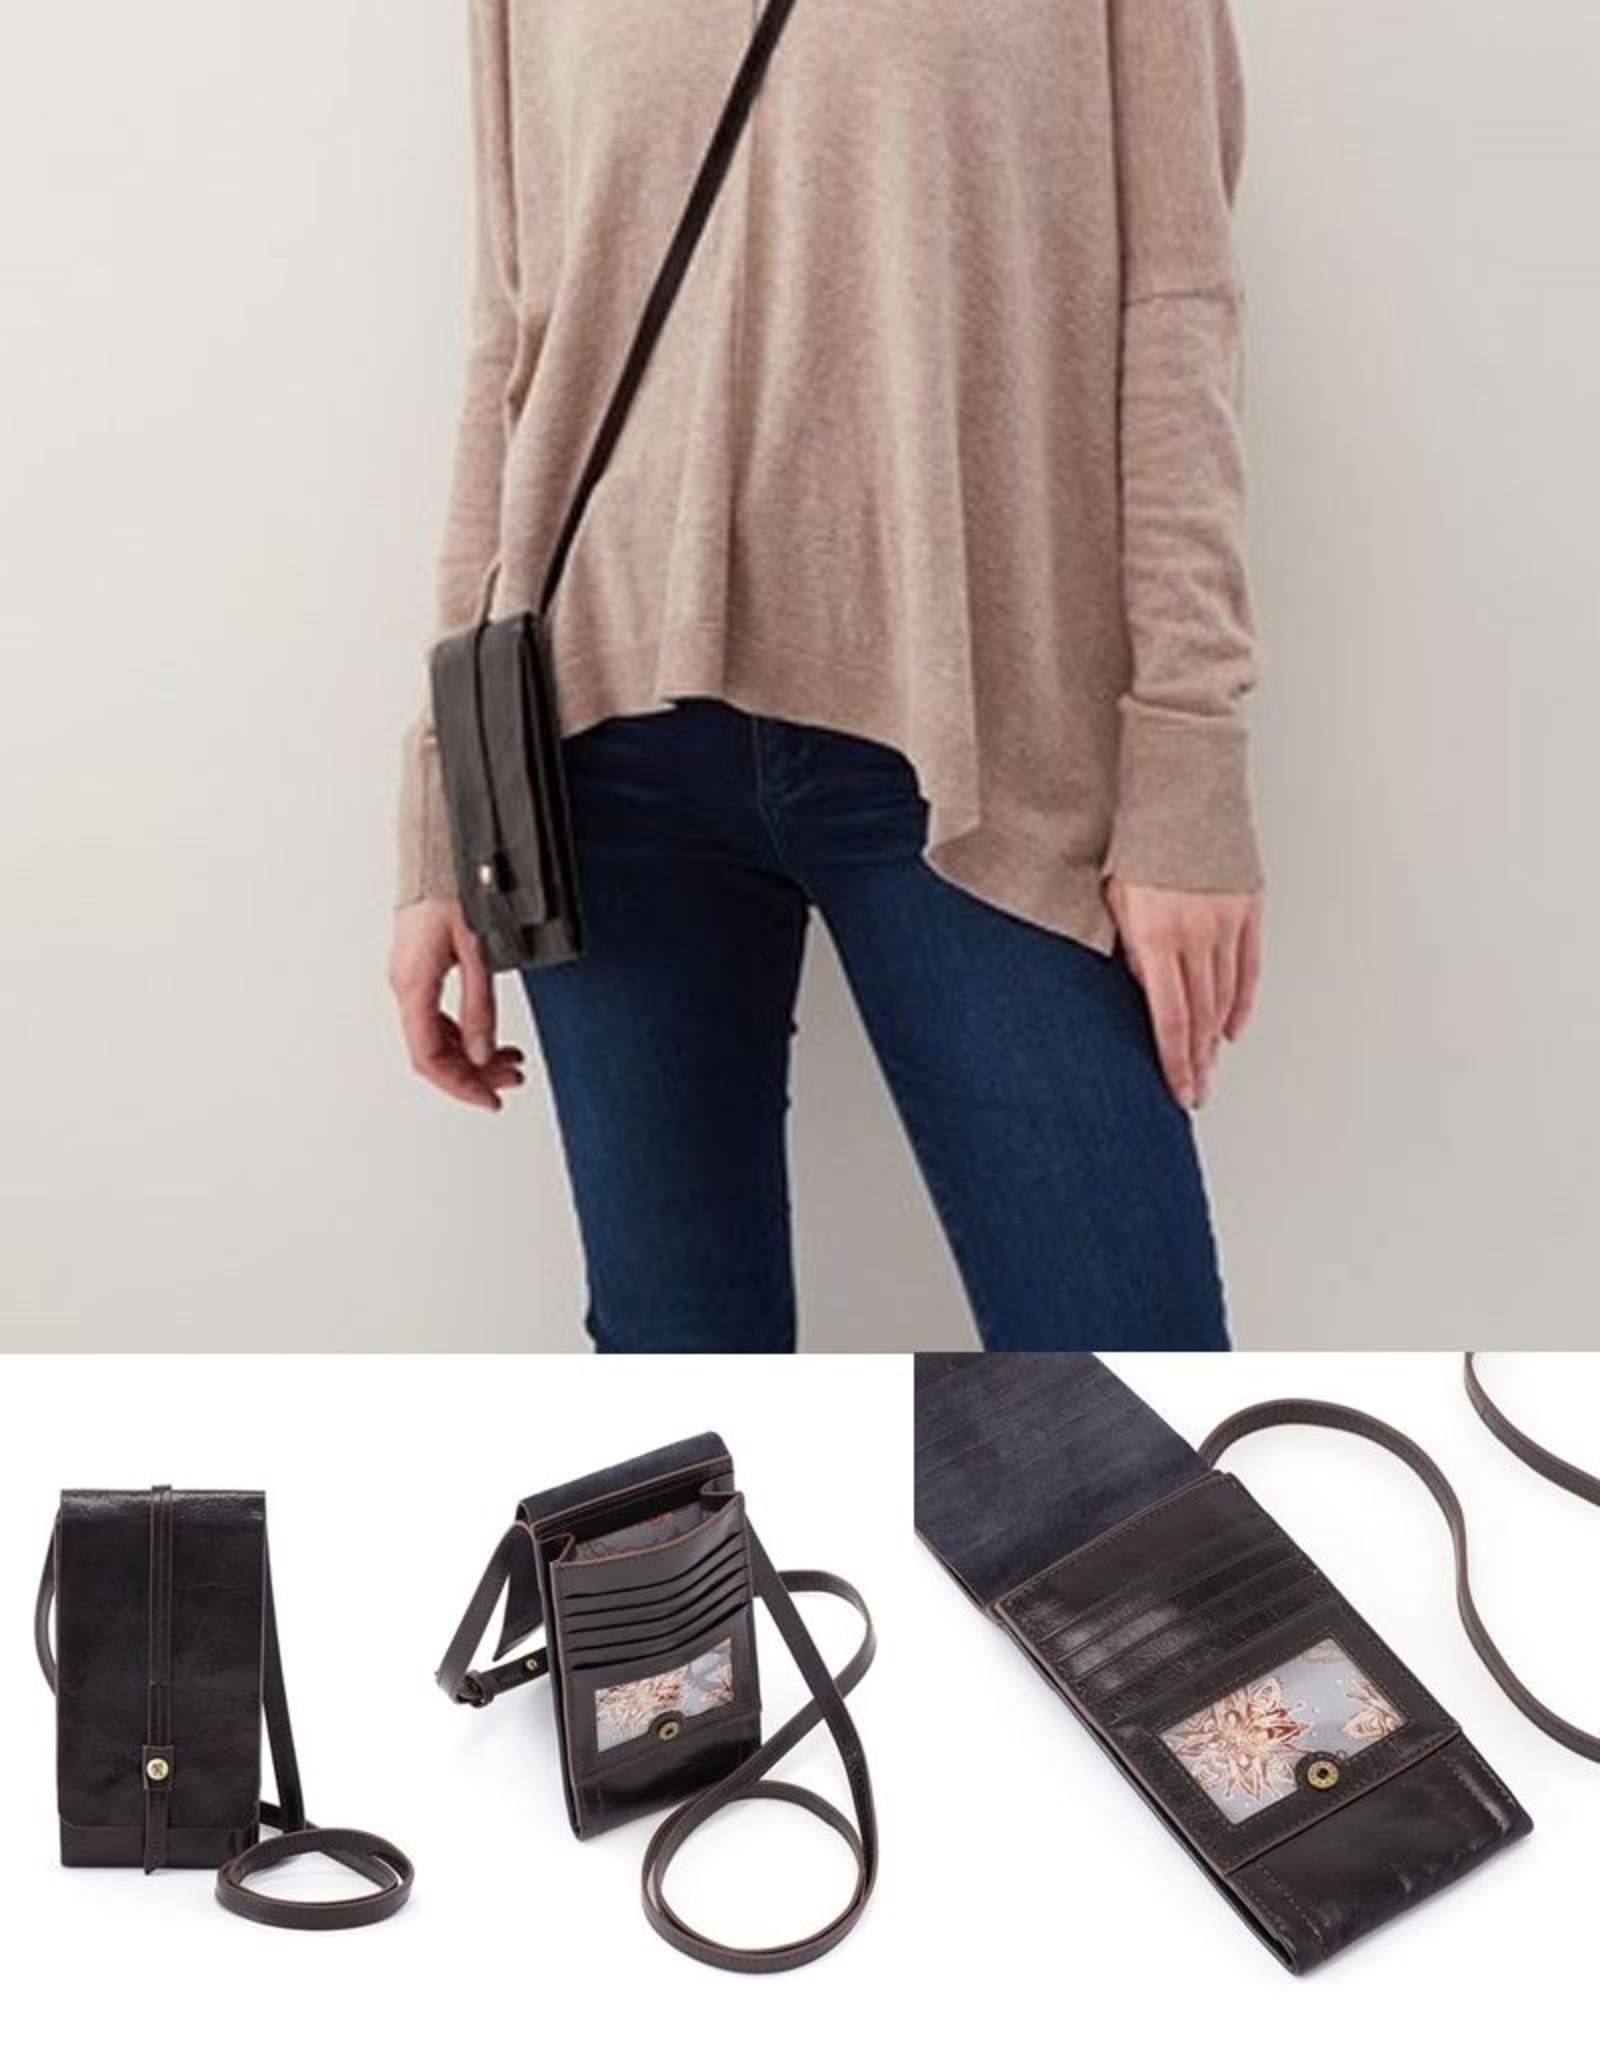 Hobo Int'l/Urban Oxide Token Mini Crossbody Bag